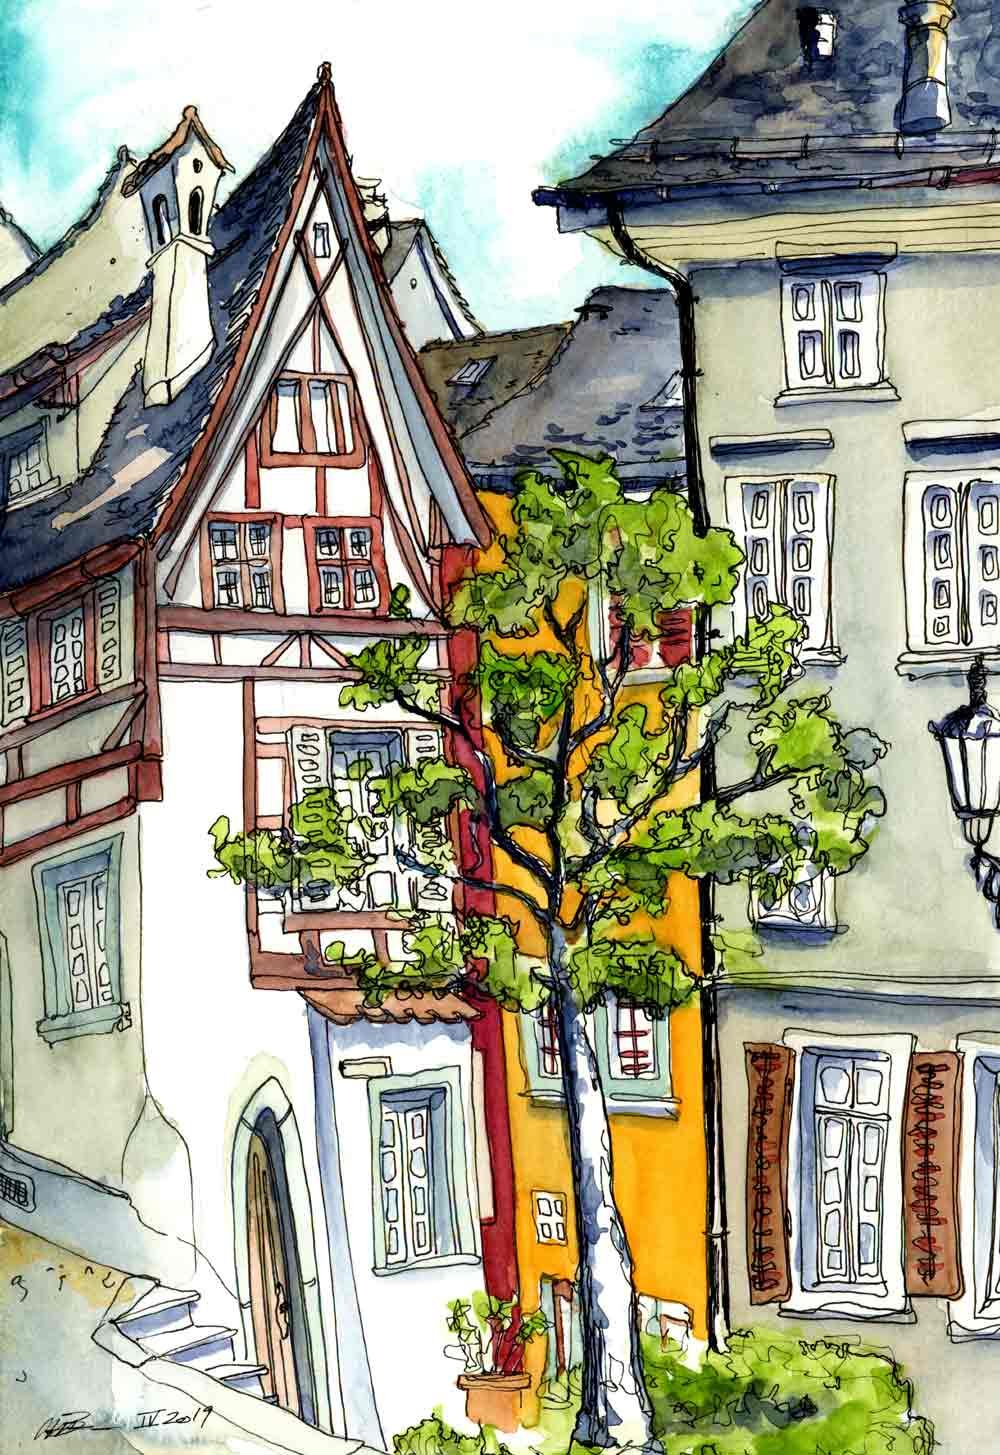 Untere Halde urban sketch Susanne Brem